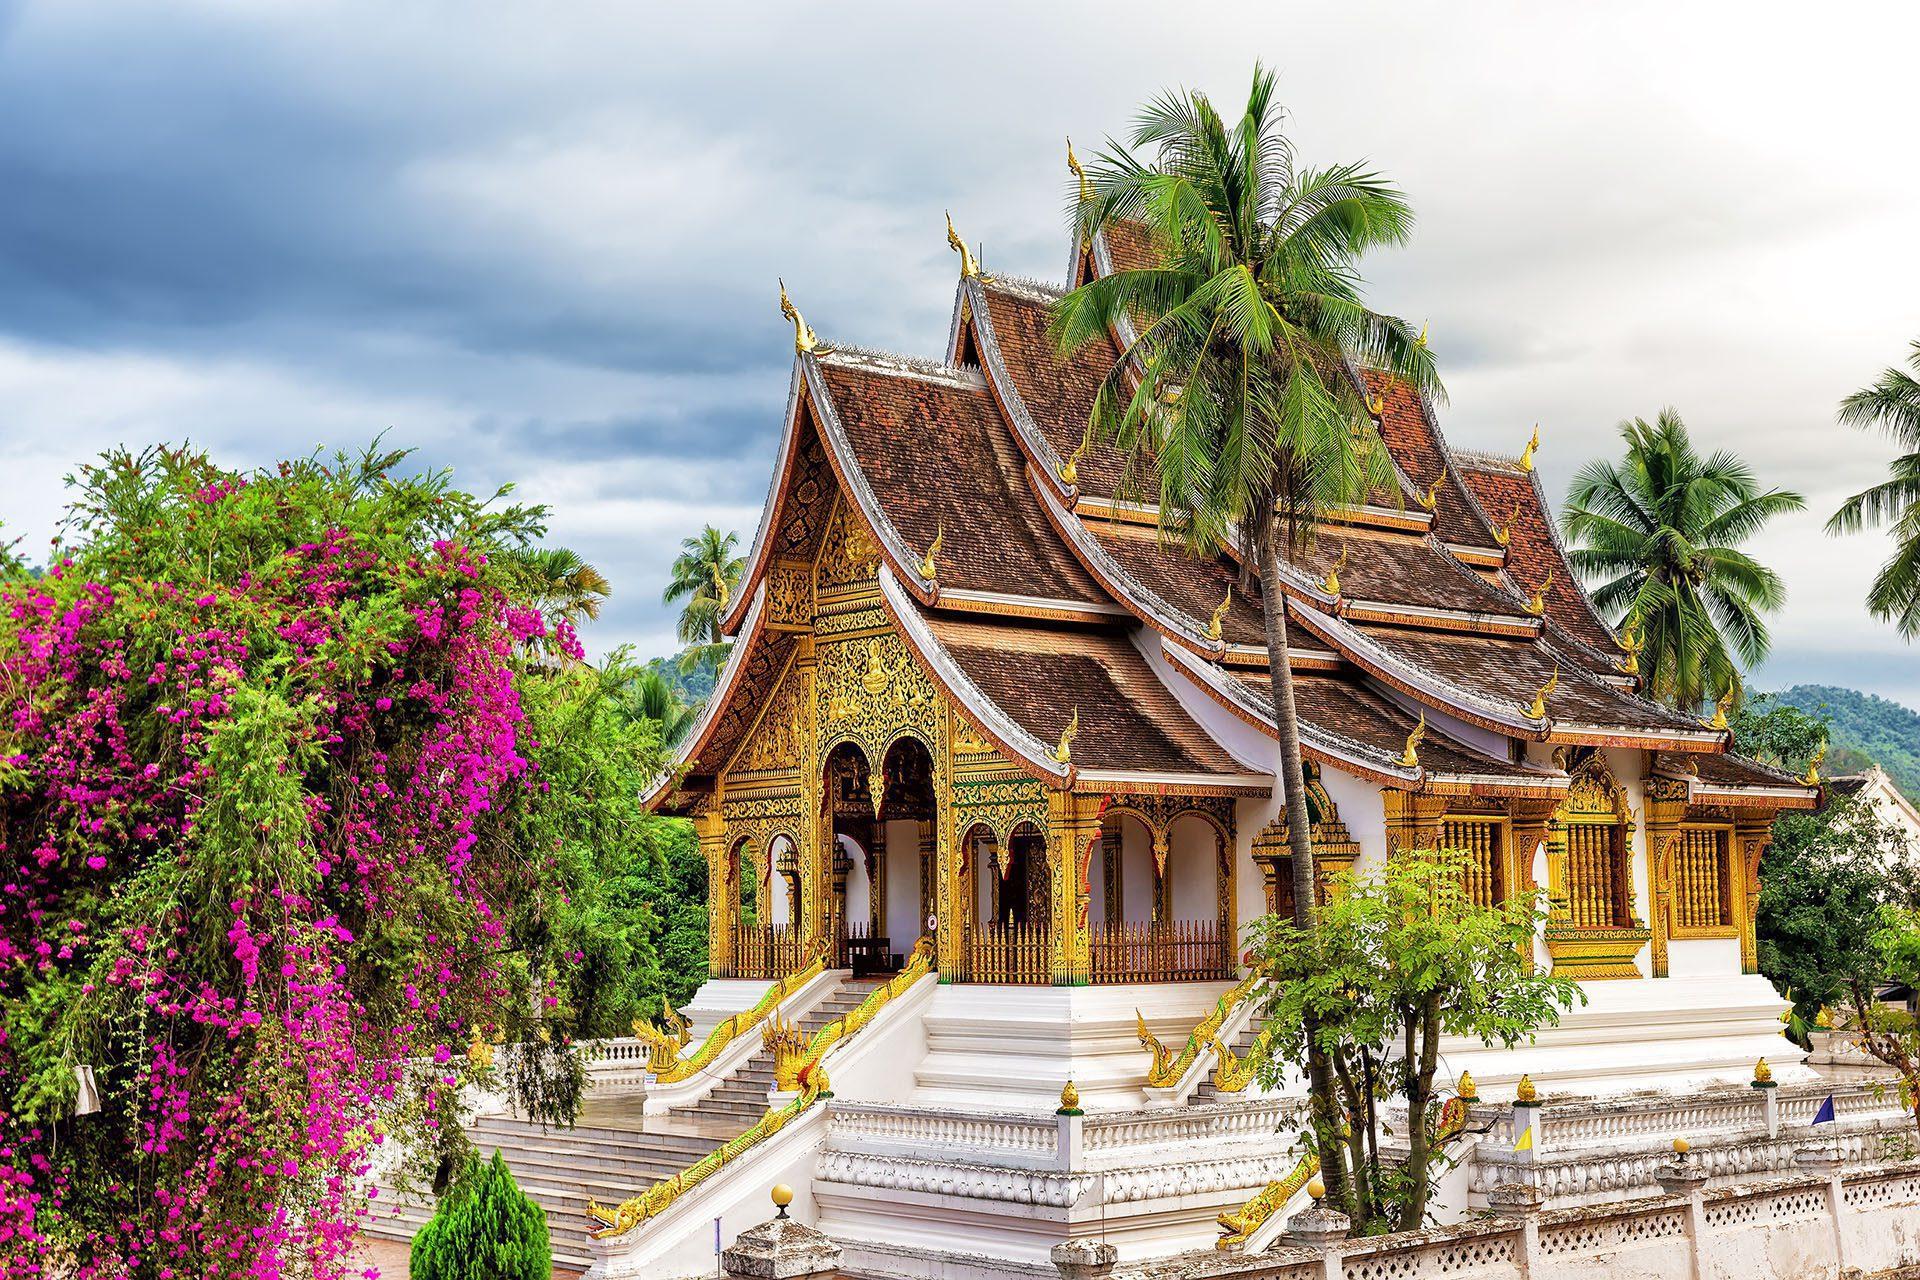 Destination gay de Luang Prabang